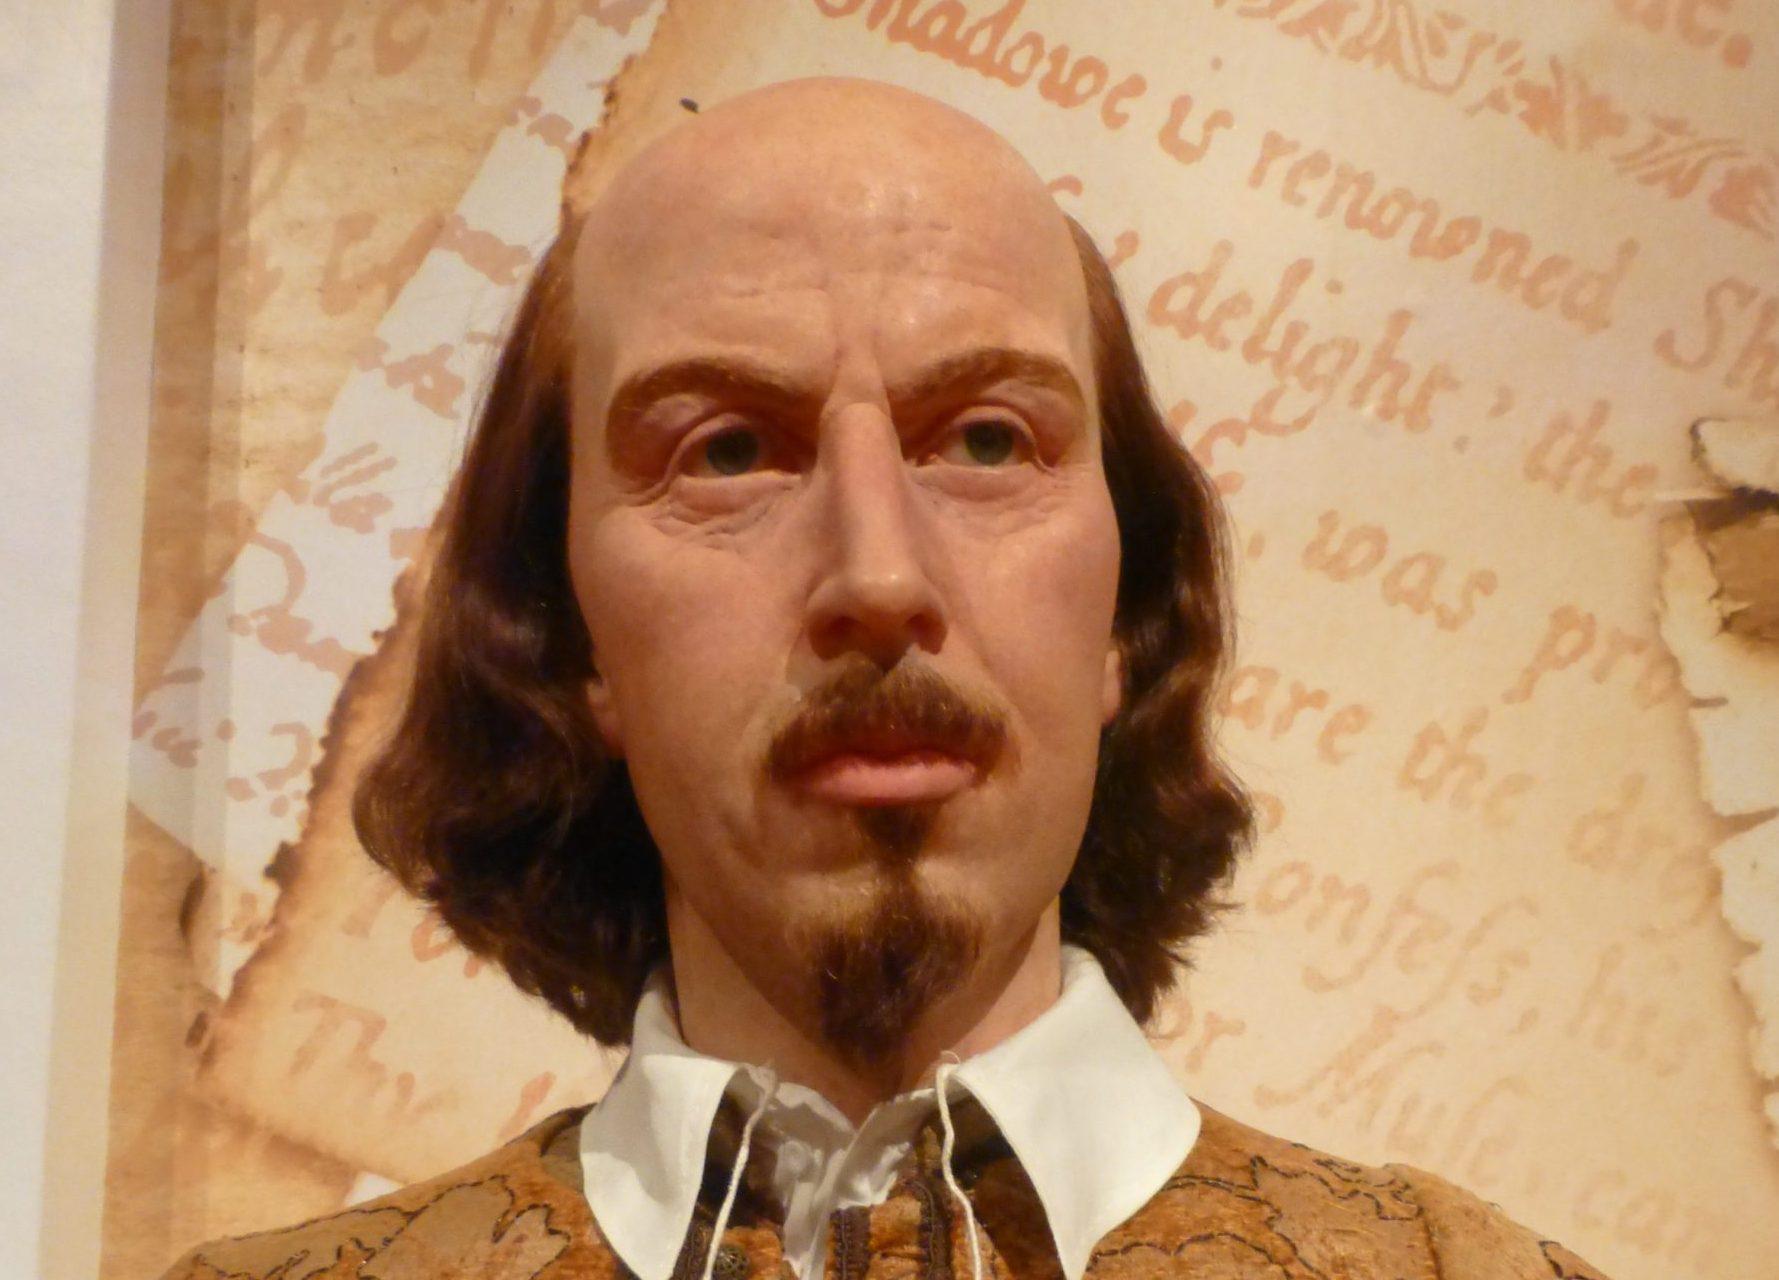 William Shakespeare bei Madame Tussauds